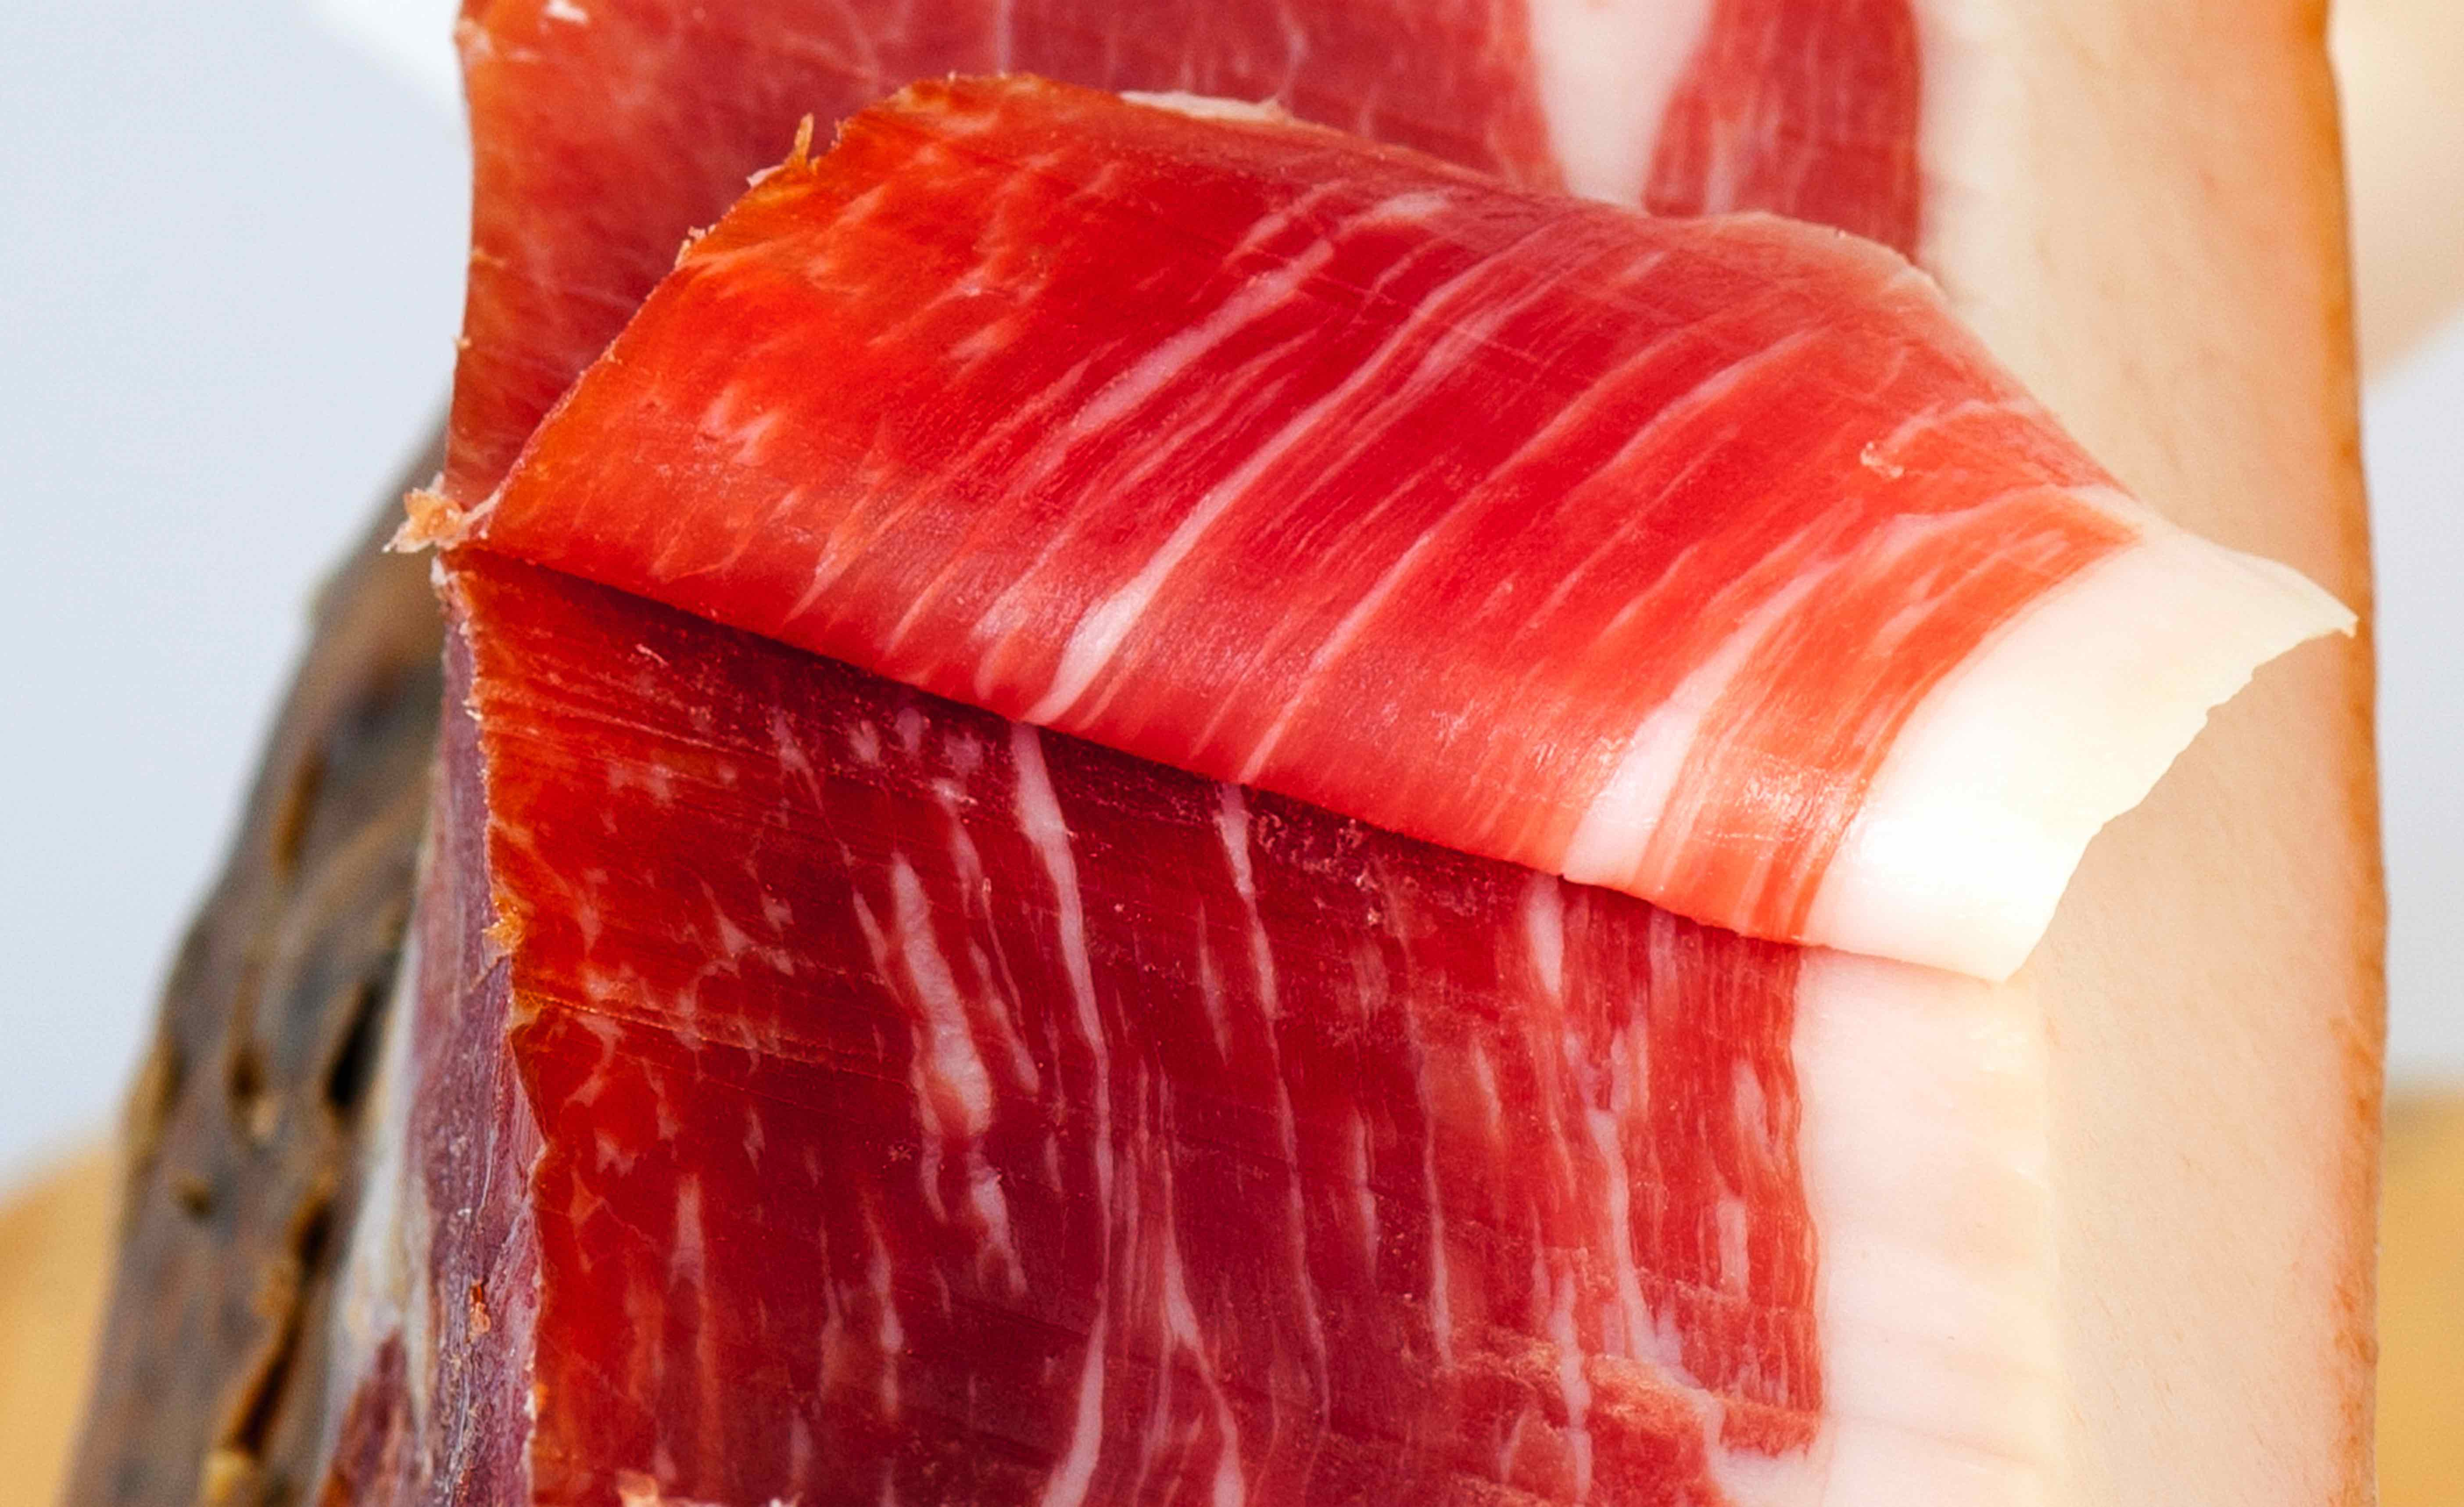 7 razones para consumir alimentos ecológicos